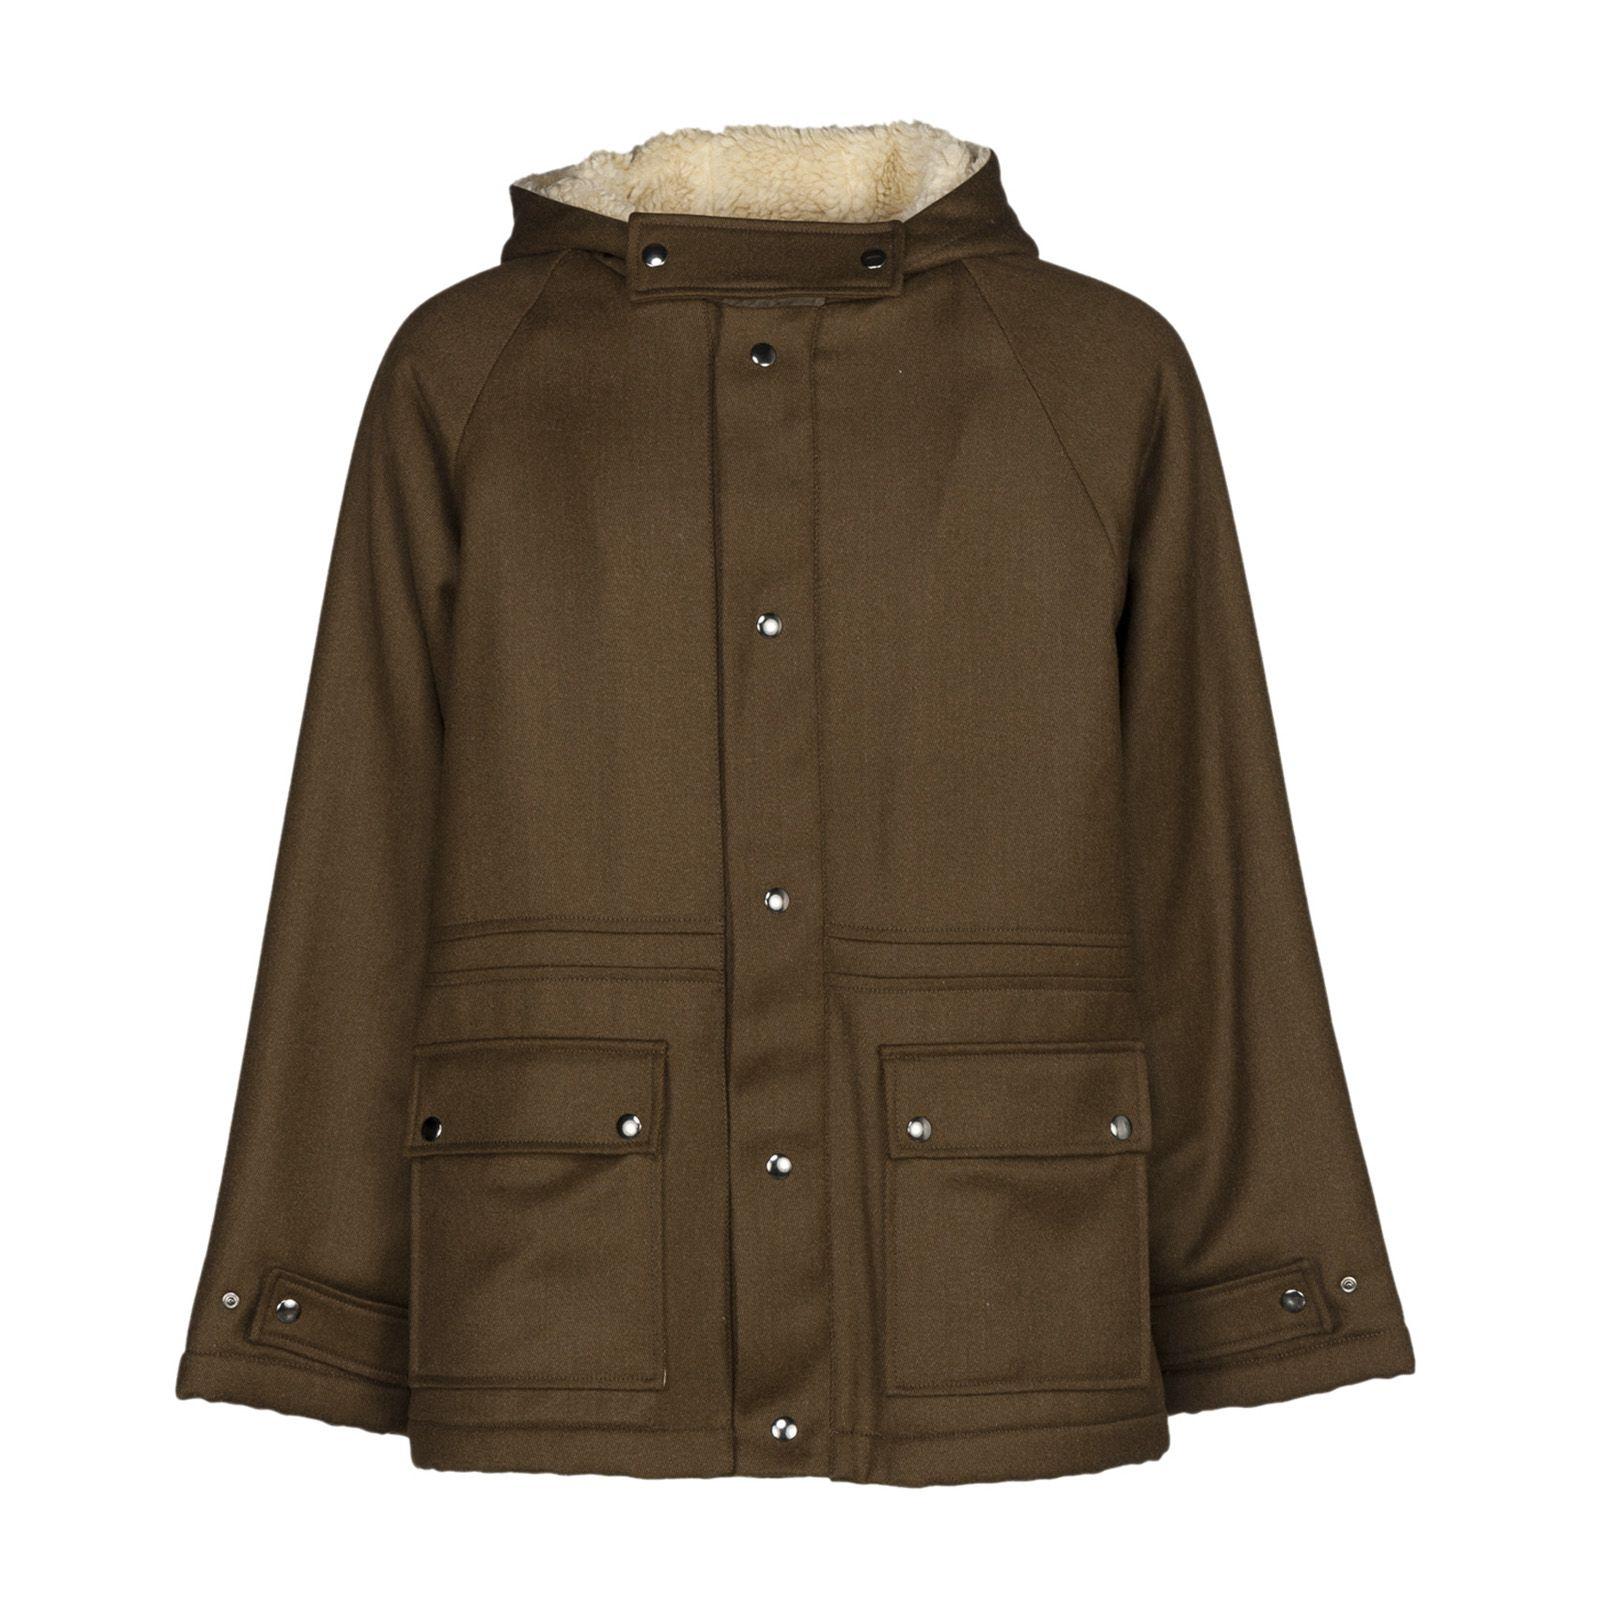 Gosha Rubchinskiy Duffle Coat